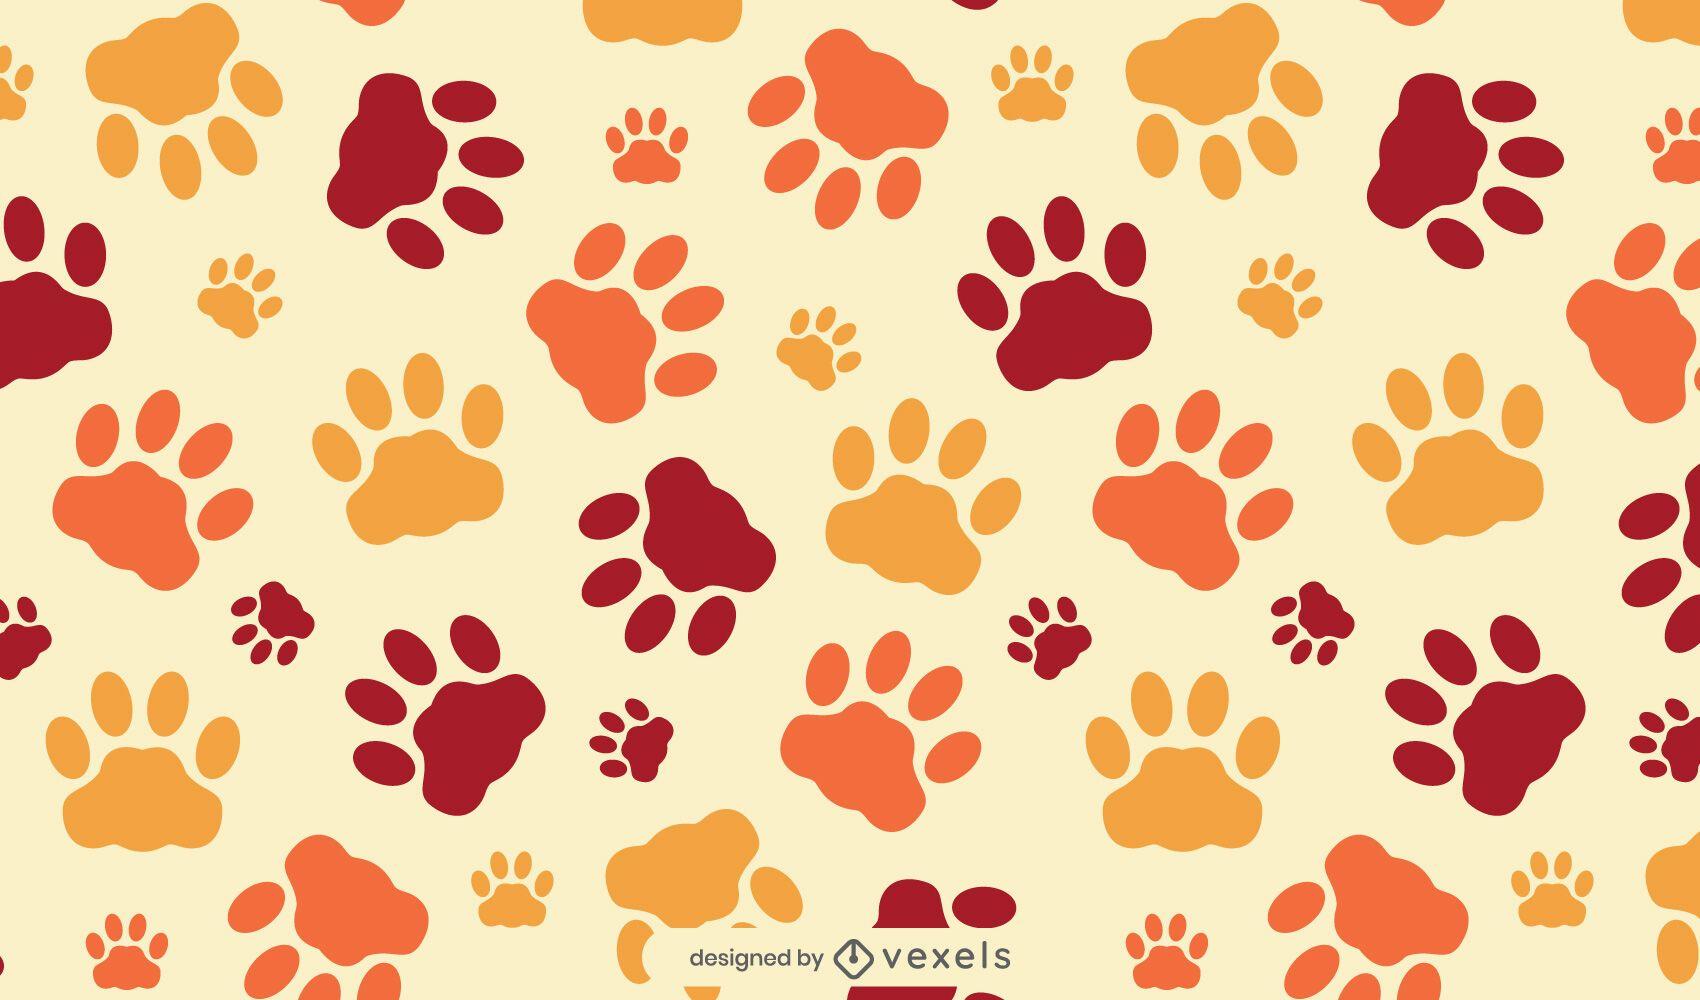 Cat paws pattern design